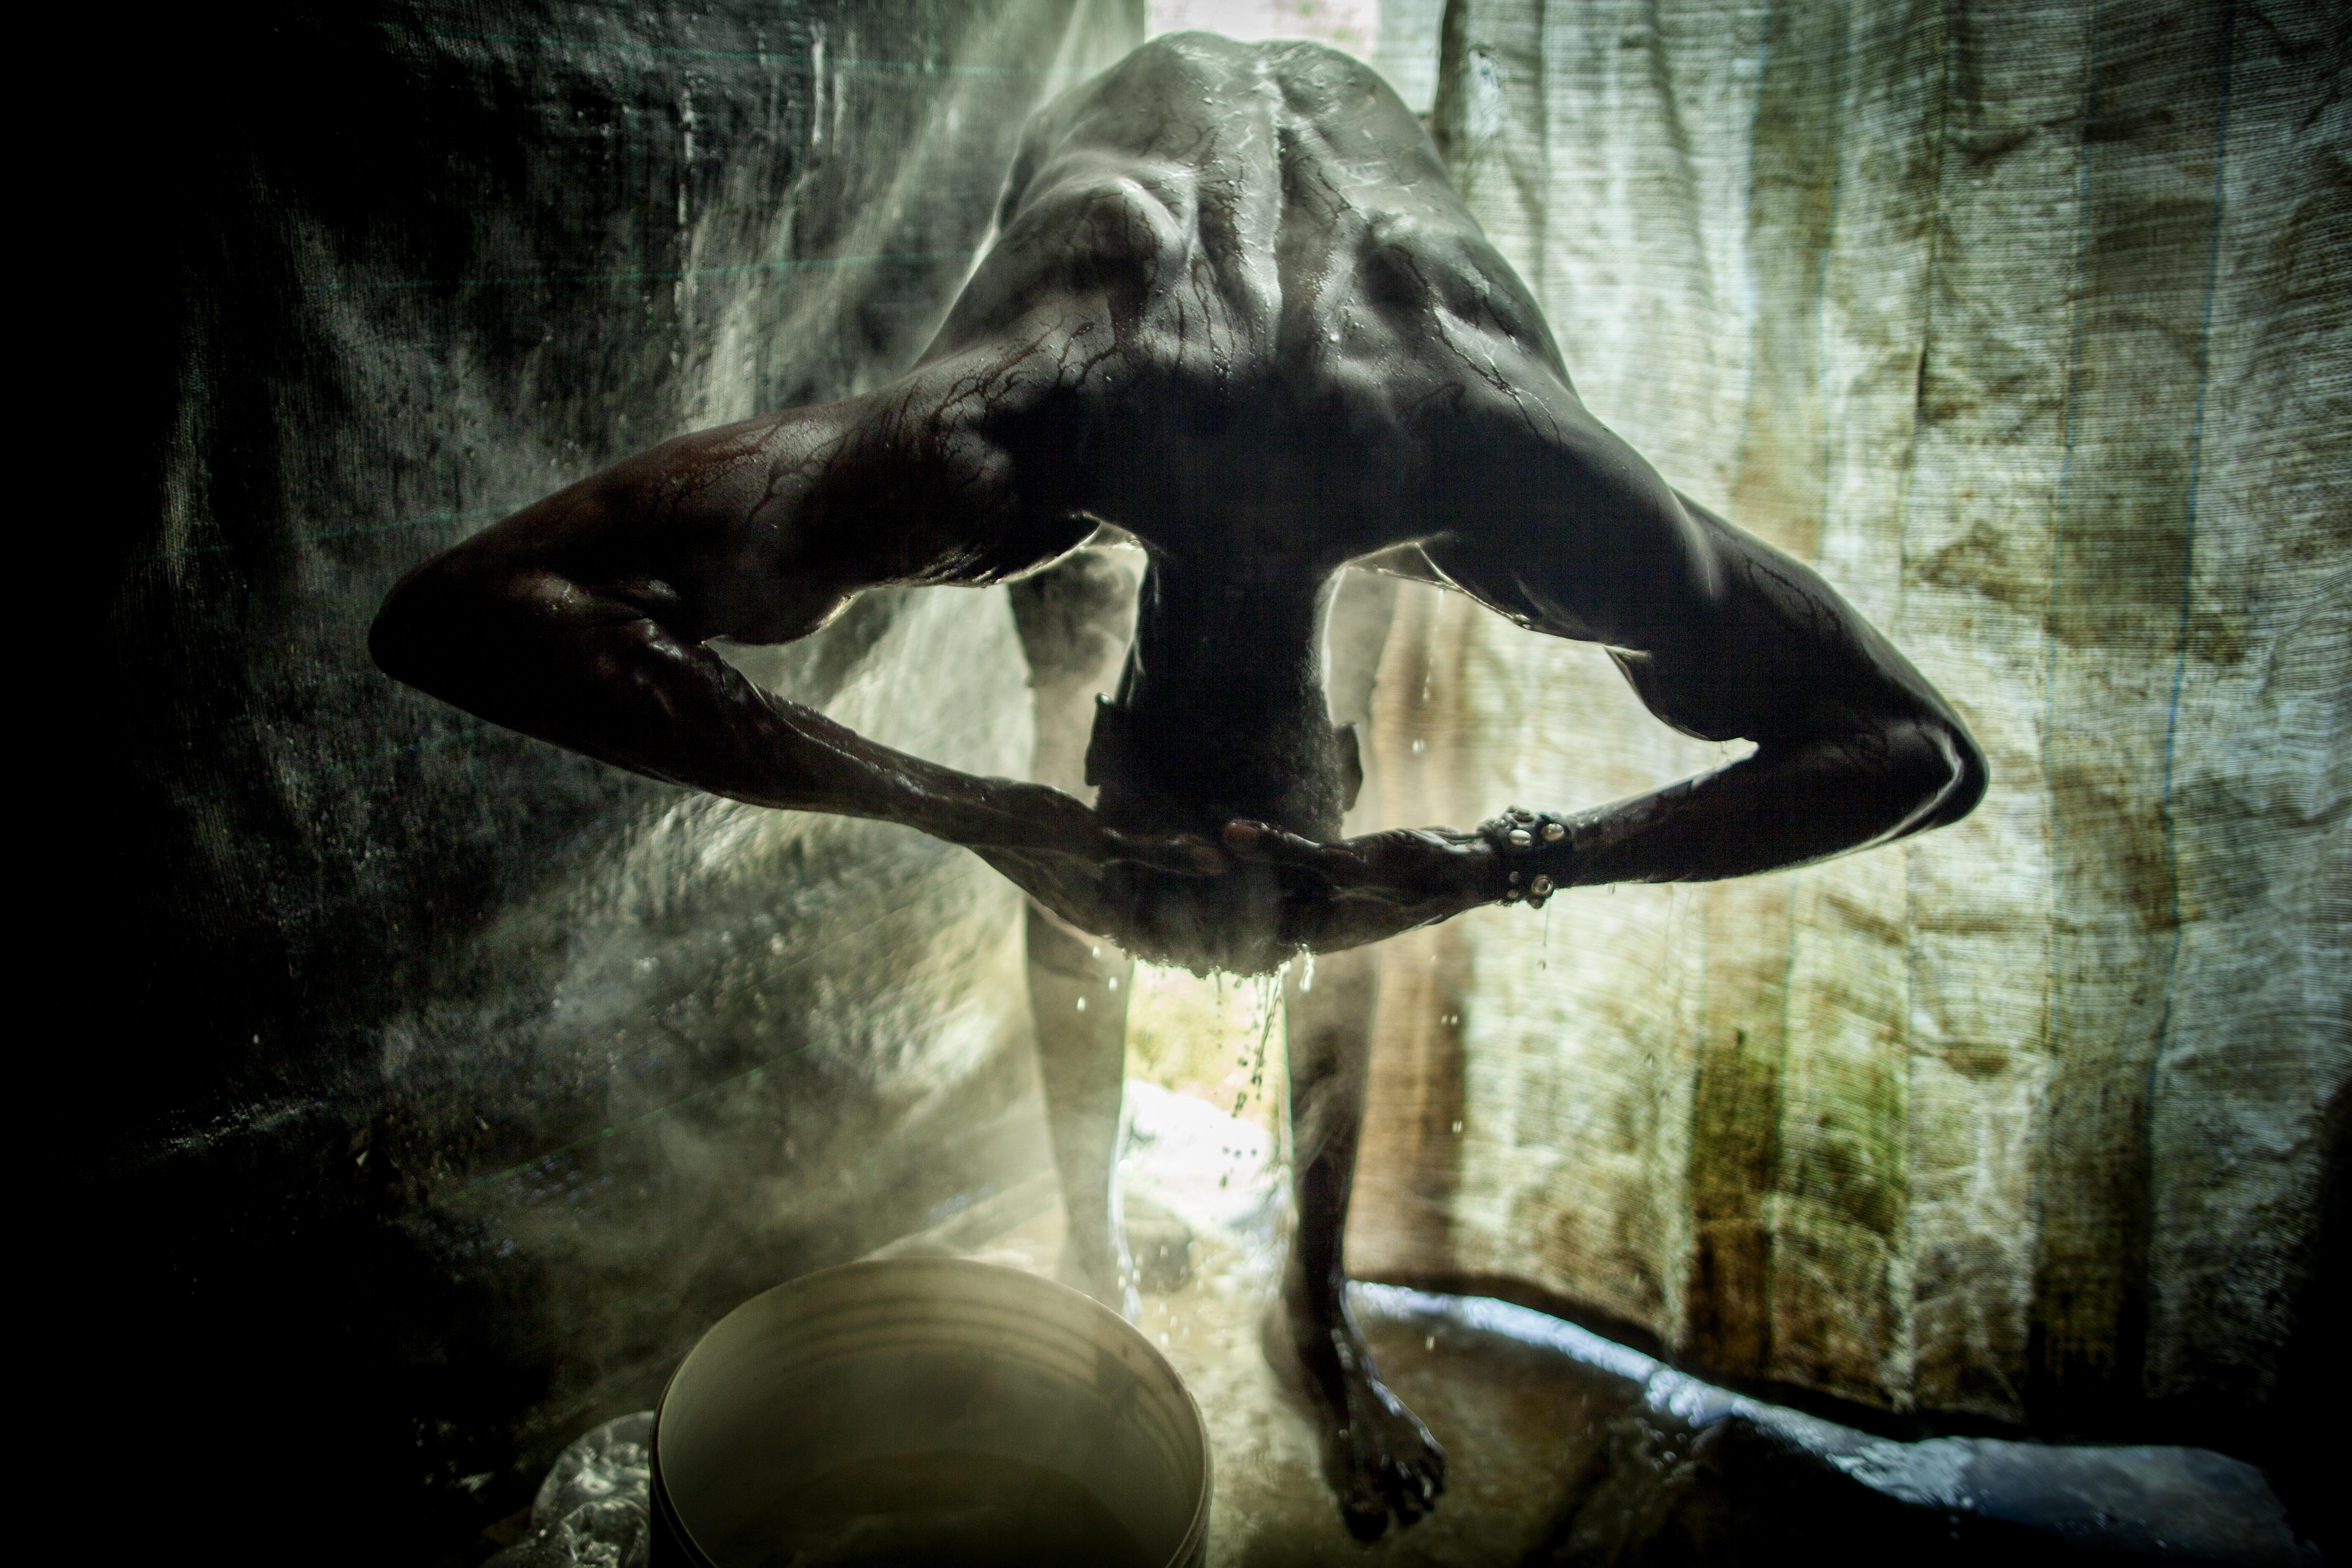 © Alessandro Zenti - alessandrozenti.it